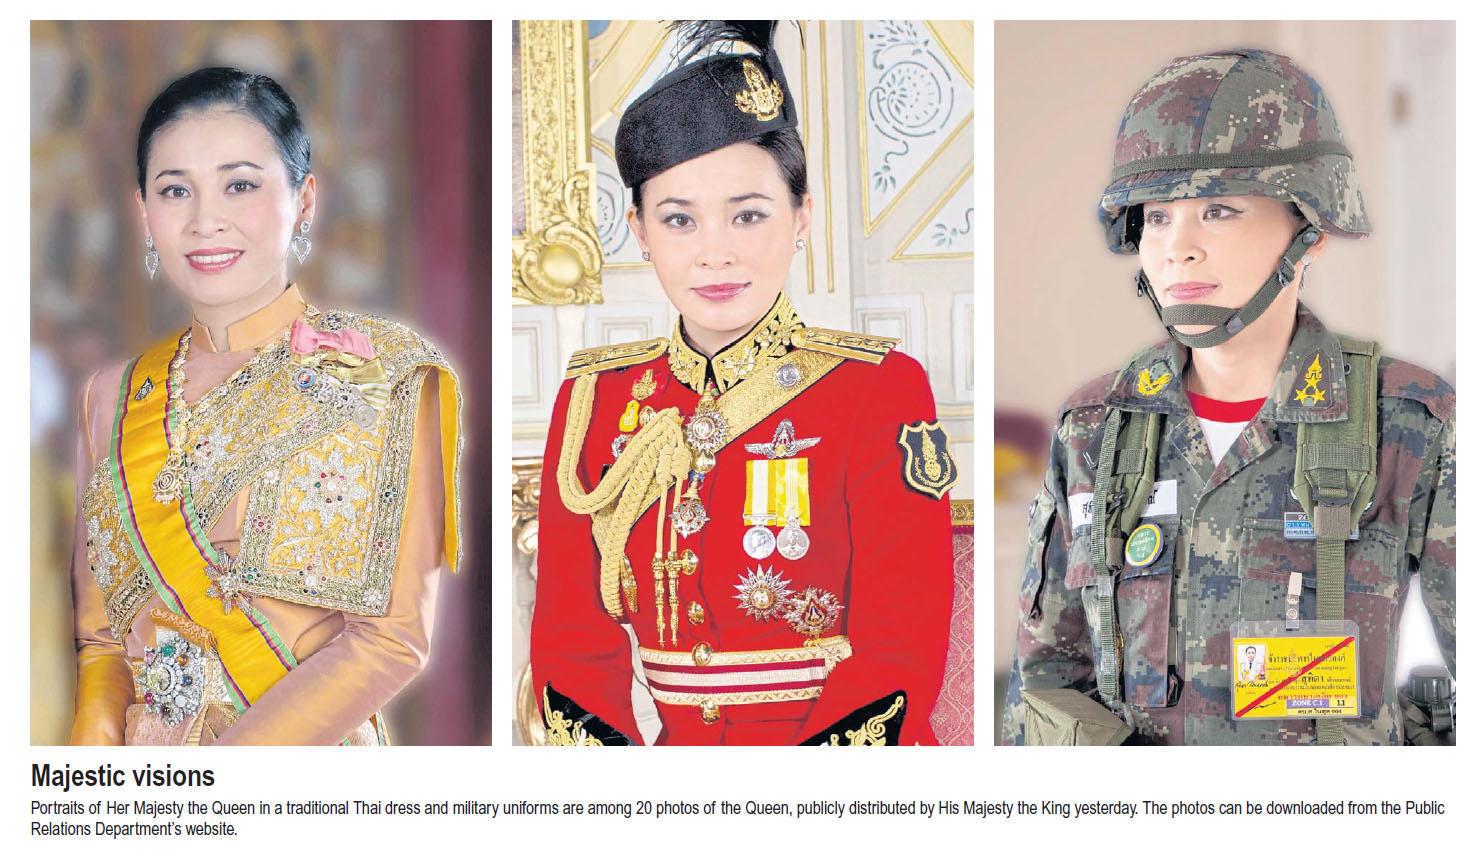 Bangkok Post 2019-05-18 Majestic Visions.jpg